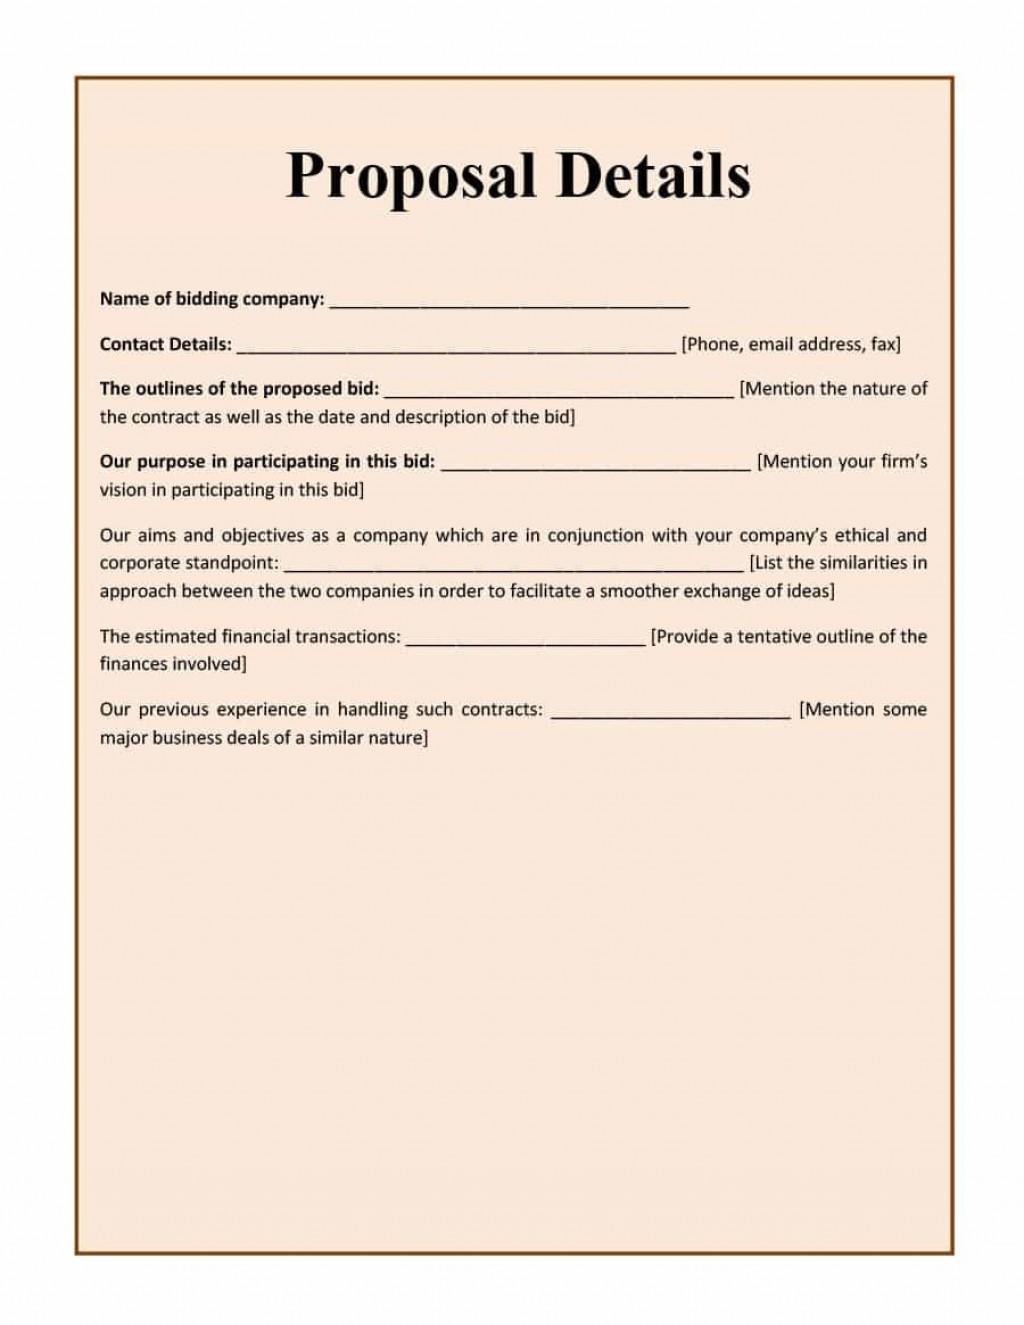 002 Formidable Free Bid Proposal Template High Resolution  Printable Form Word Construction DownloadLarge